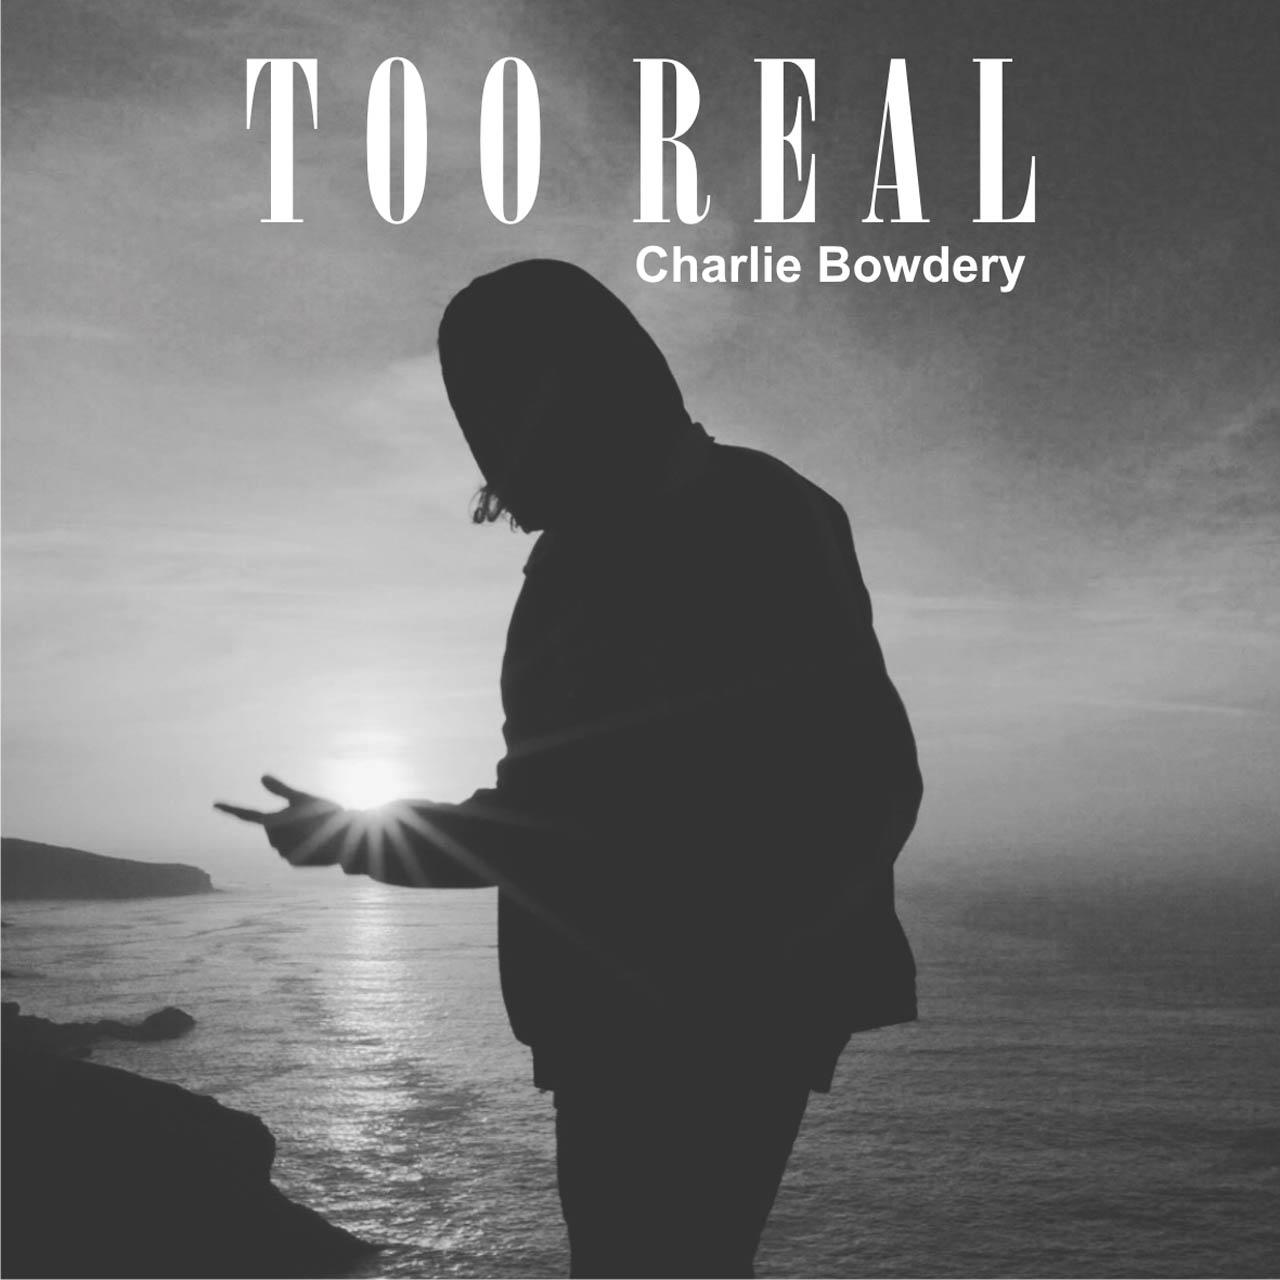 Charlie Bowdery  - Tool Real